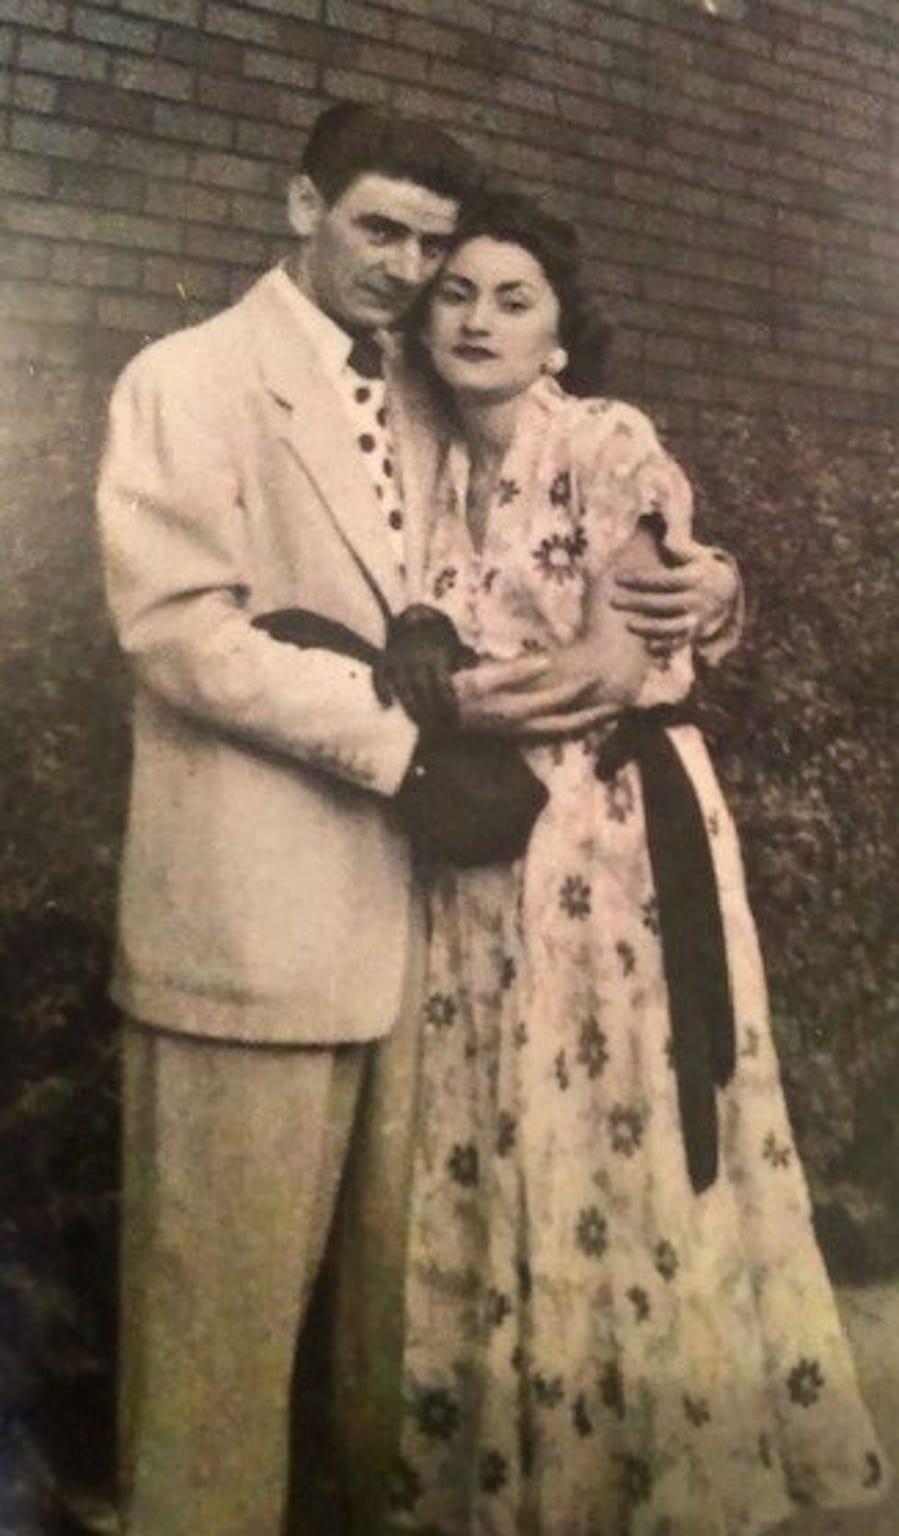 Sophie Klisman and her husband Bernard in the 1950s.